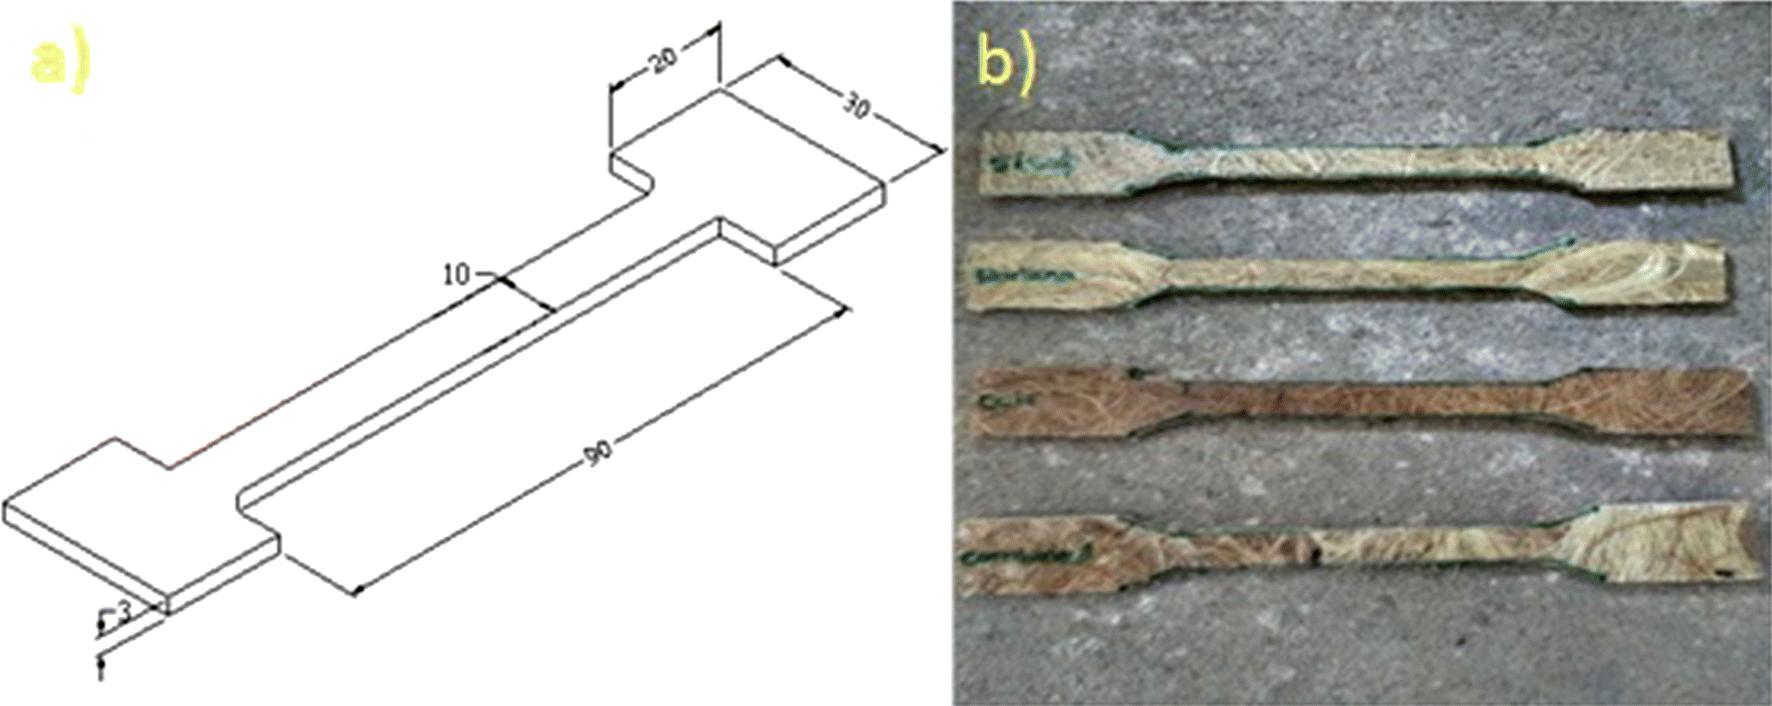 Study on mechanical and morphological properties of sisal